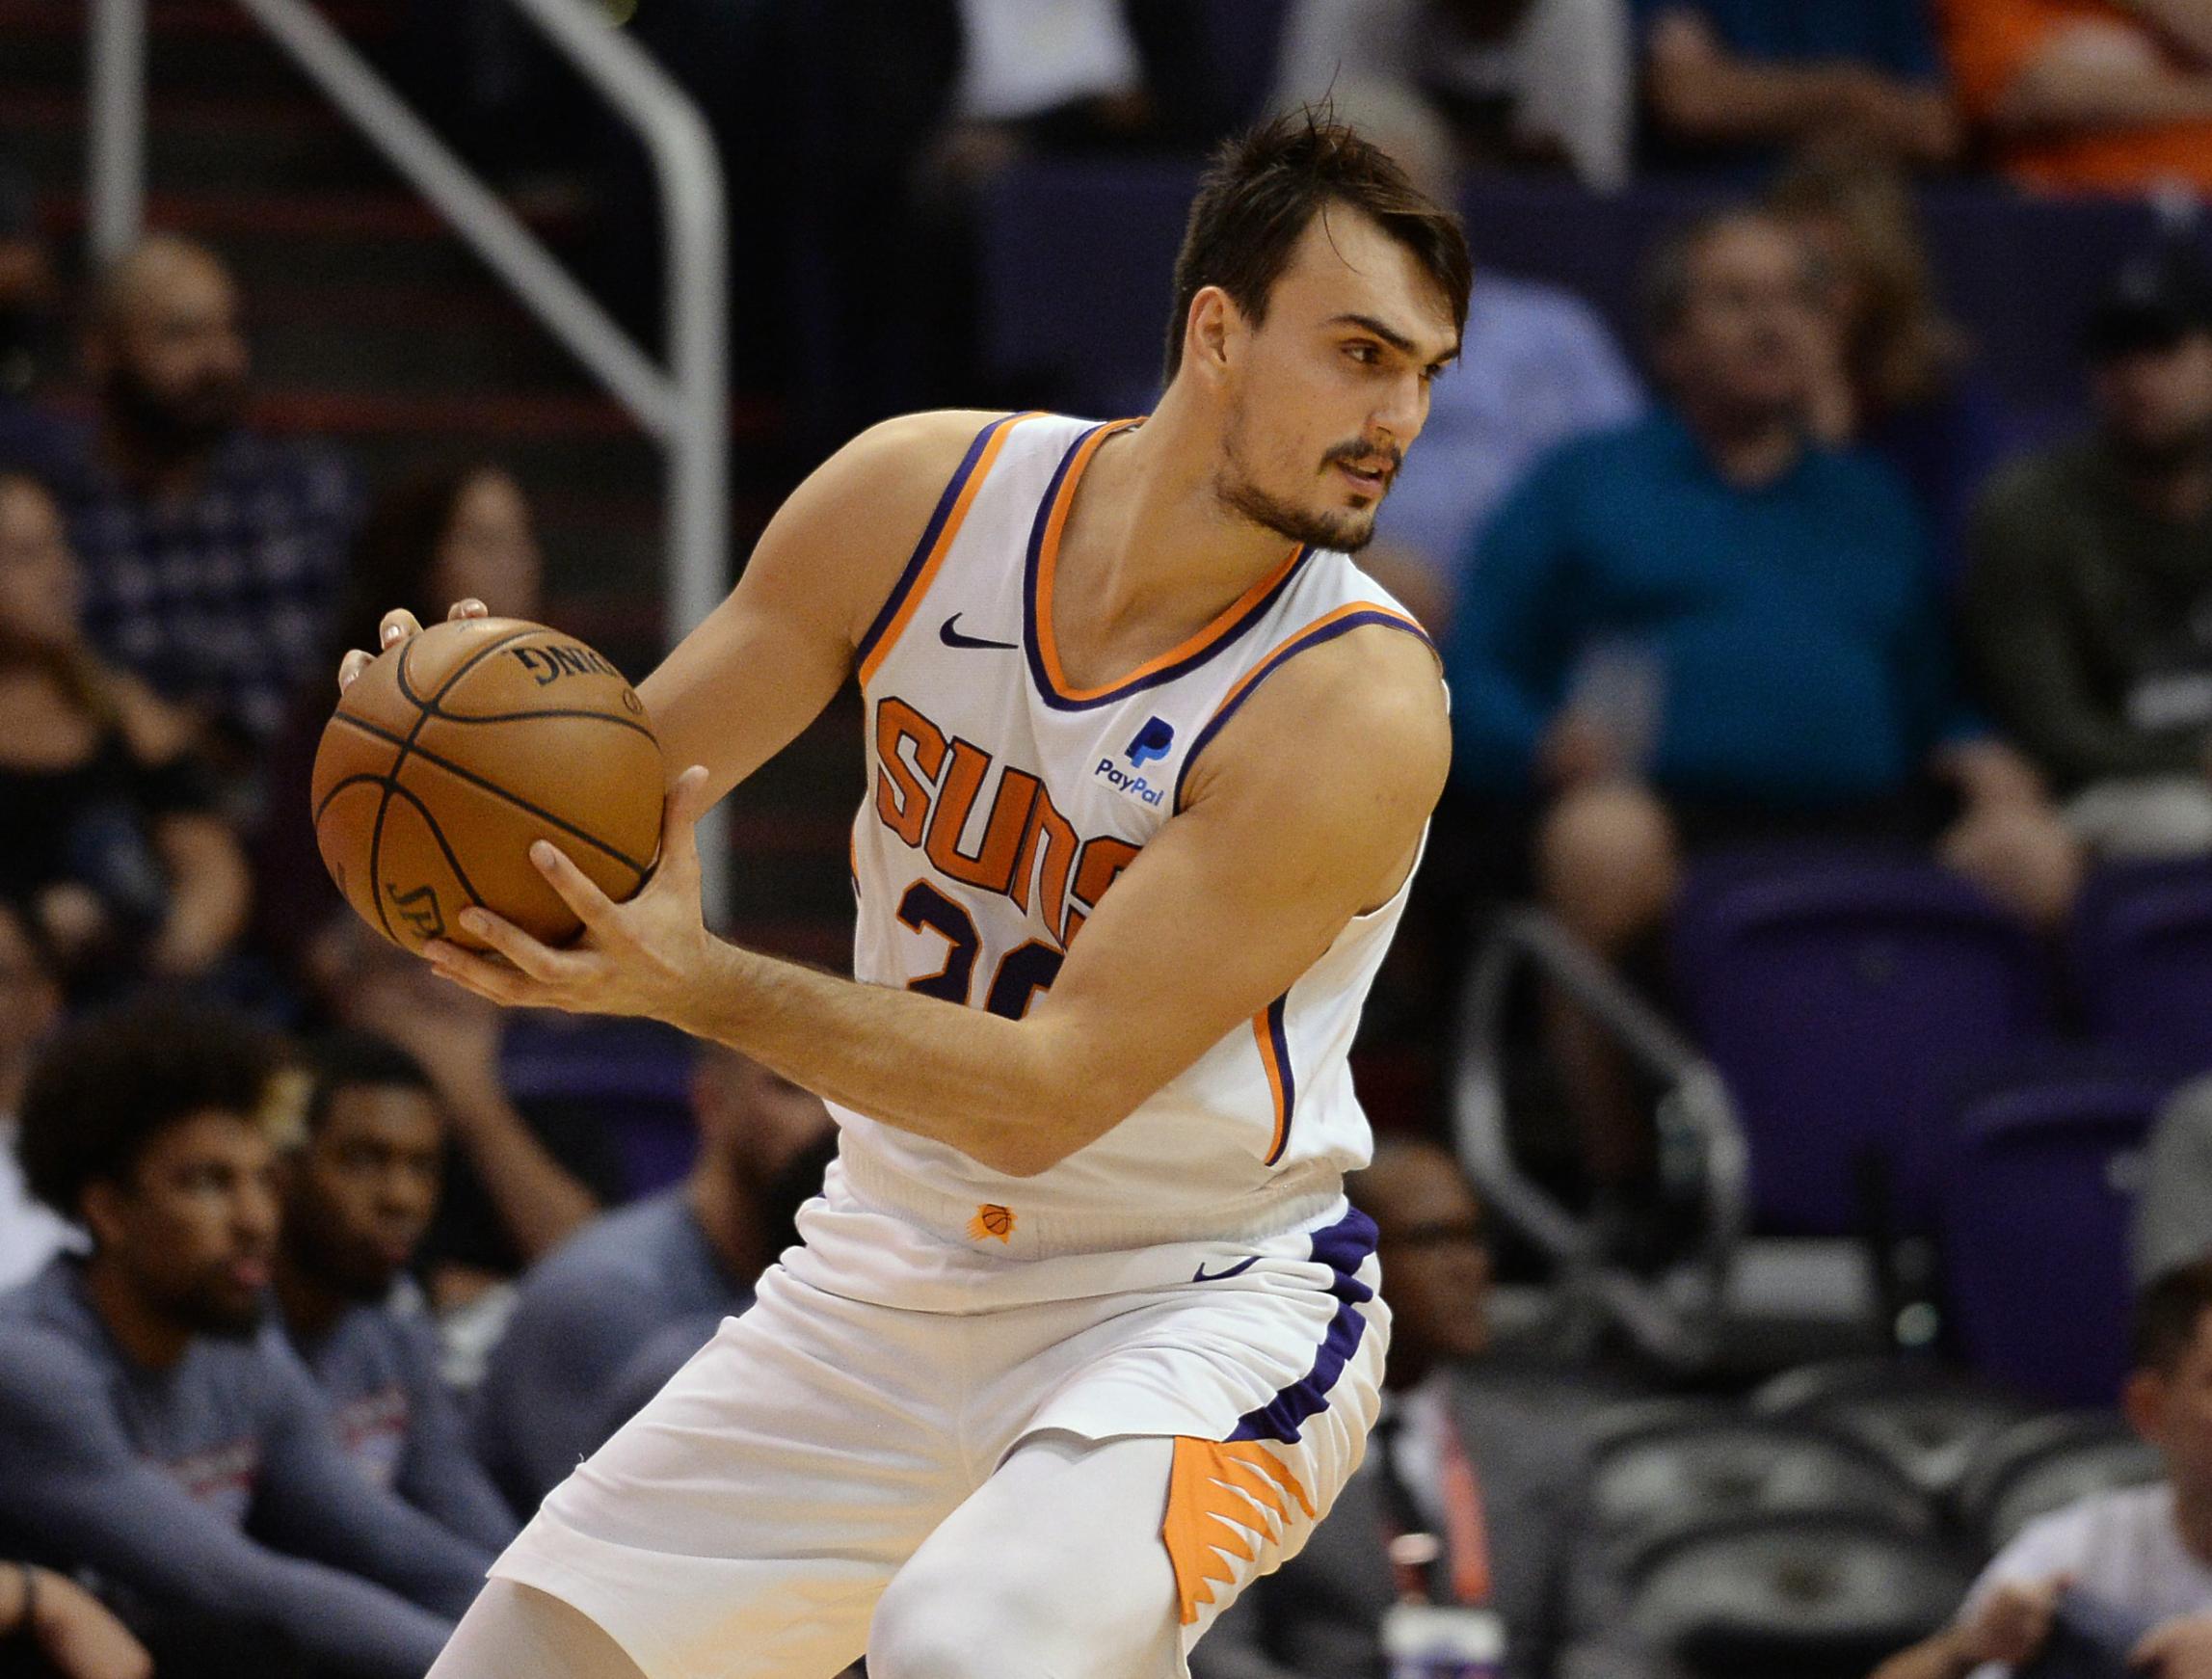 Nov 14, 2019; Phoenix, AZ, USA; Phoenix Suns forward Dario Saric (20) controls the ball against the Atlanta Hawks during the second half at Talking Stick Resort Arena. Mandatory Credit: Joe Camporeale-USA TODAY Sports - 13666197